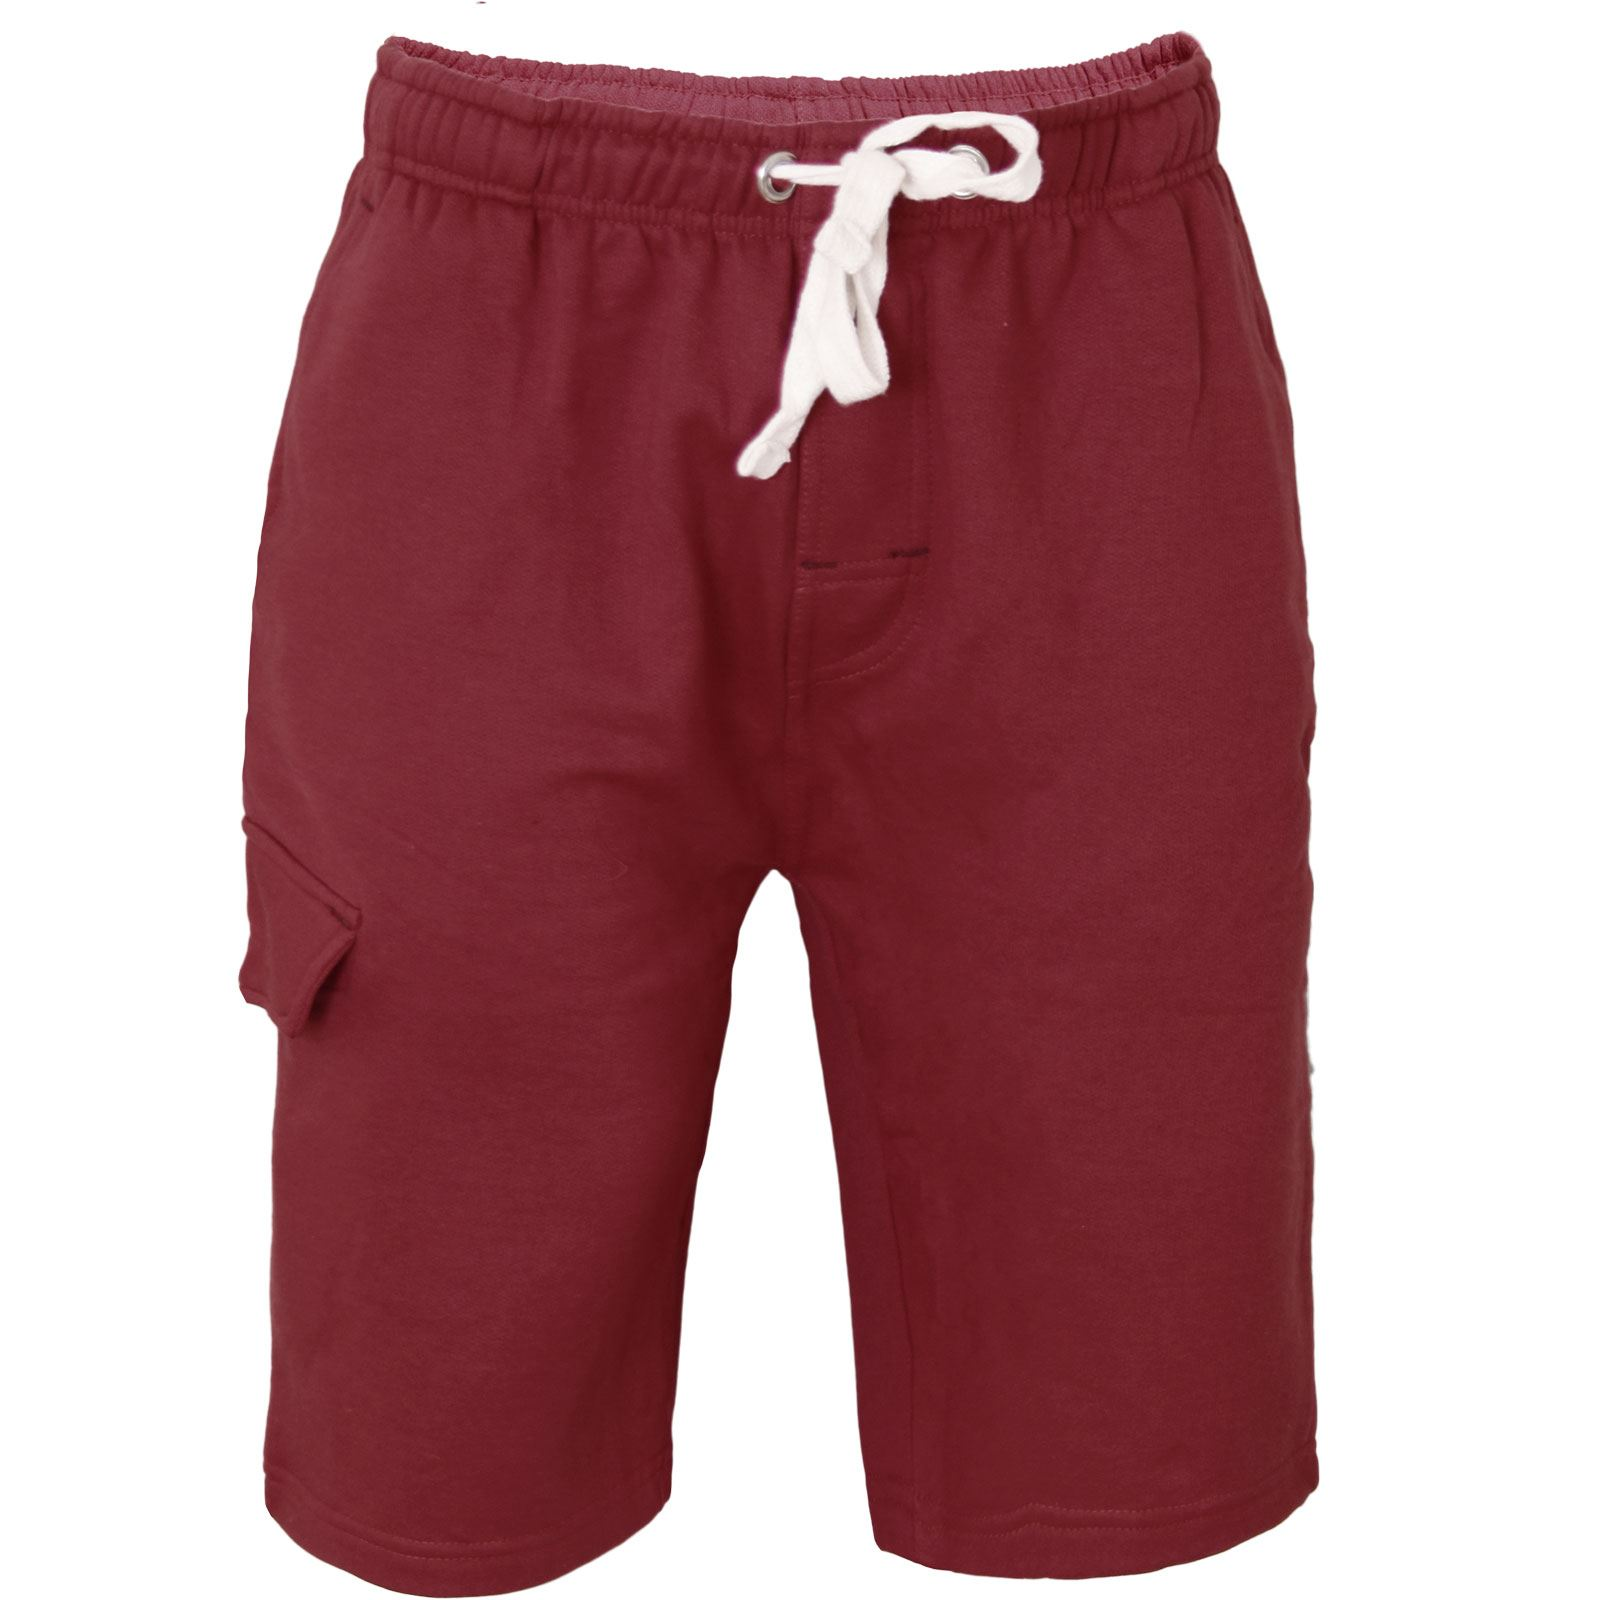 mens long 34 casual shorts summer jersey sports gym